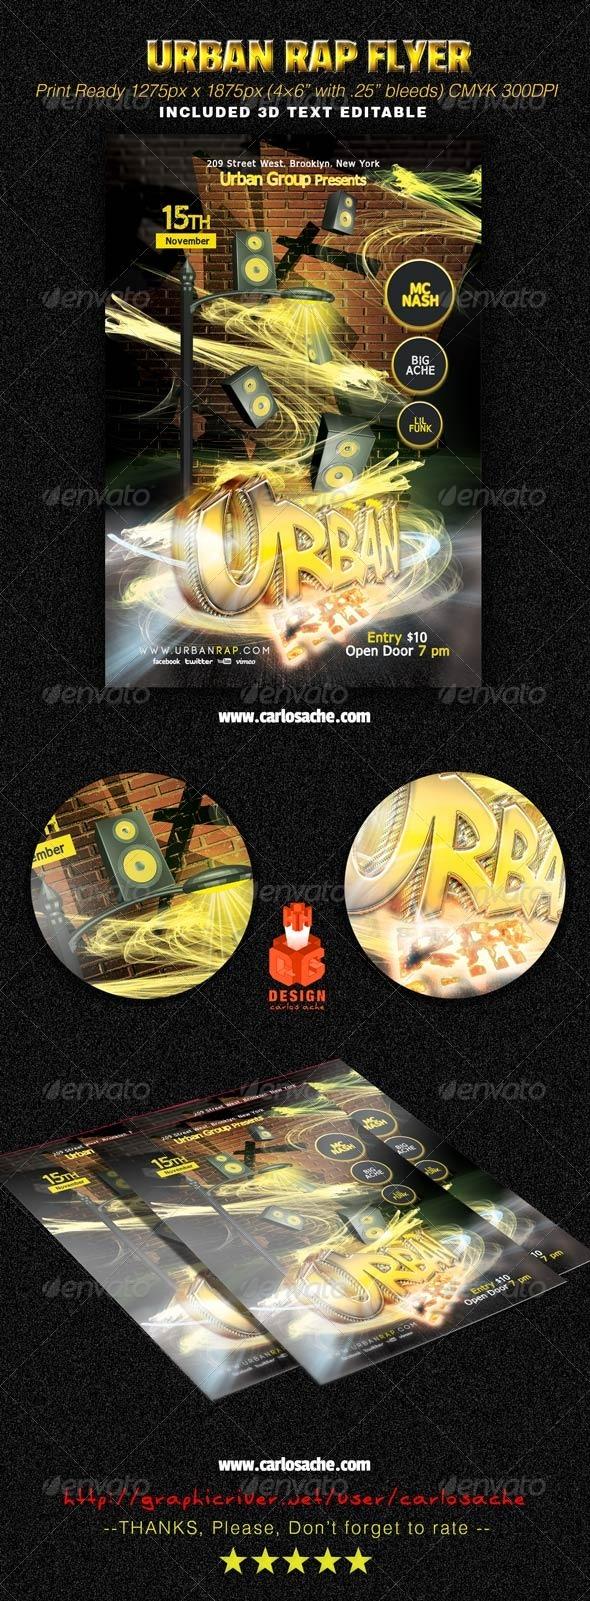 flyer-urban